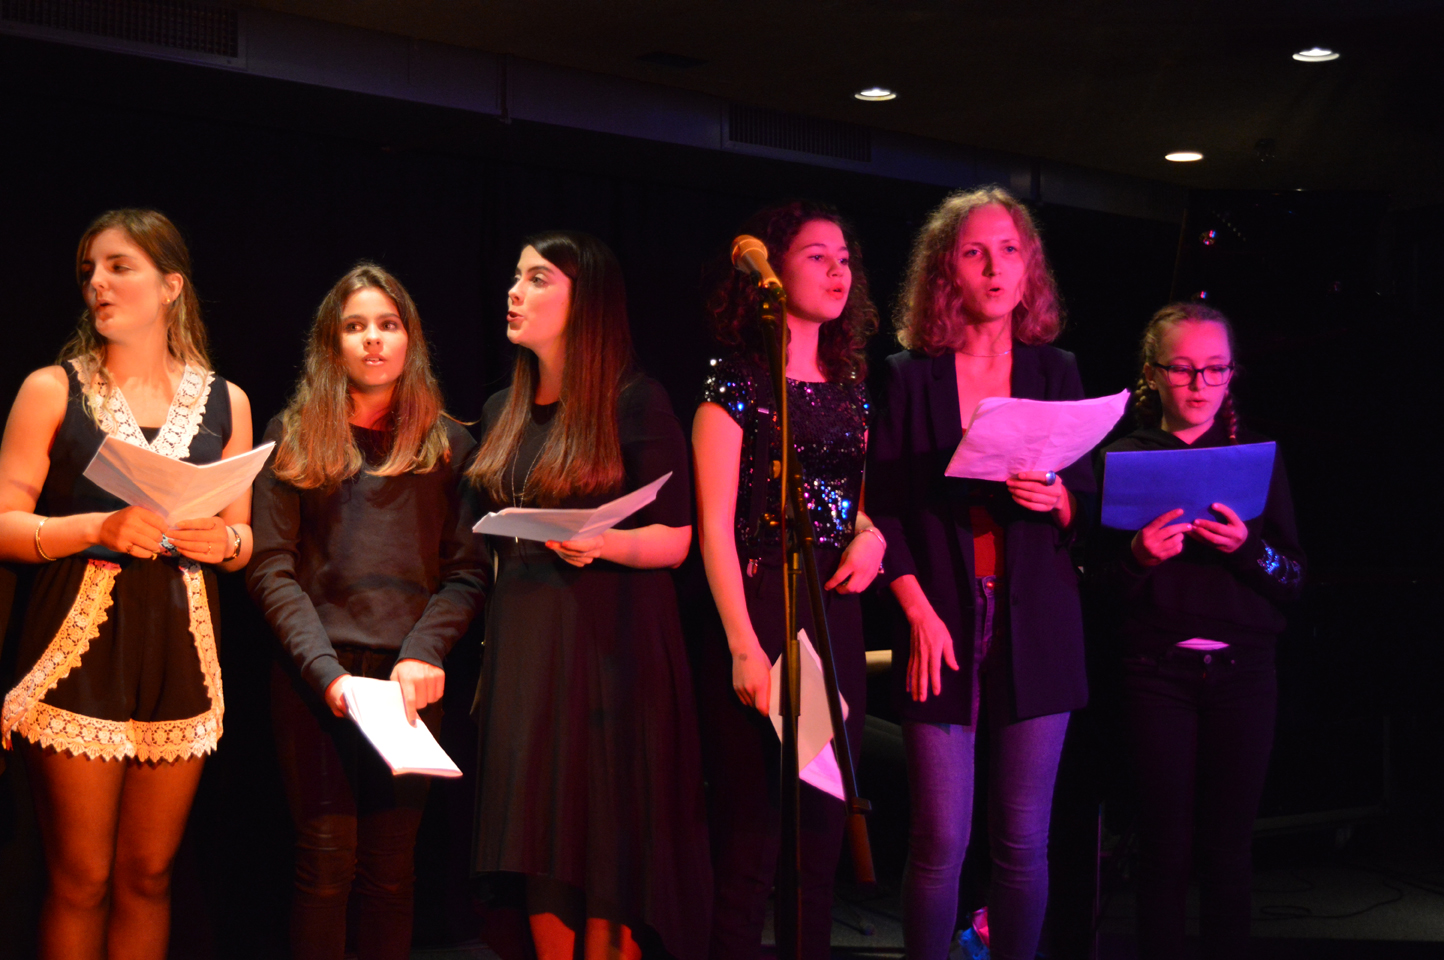 Mahogany_Hall_Vocal_Art_Konzert_2016_Vocal_Practice_Schüler